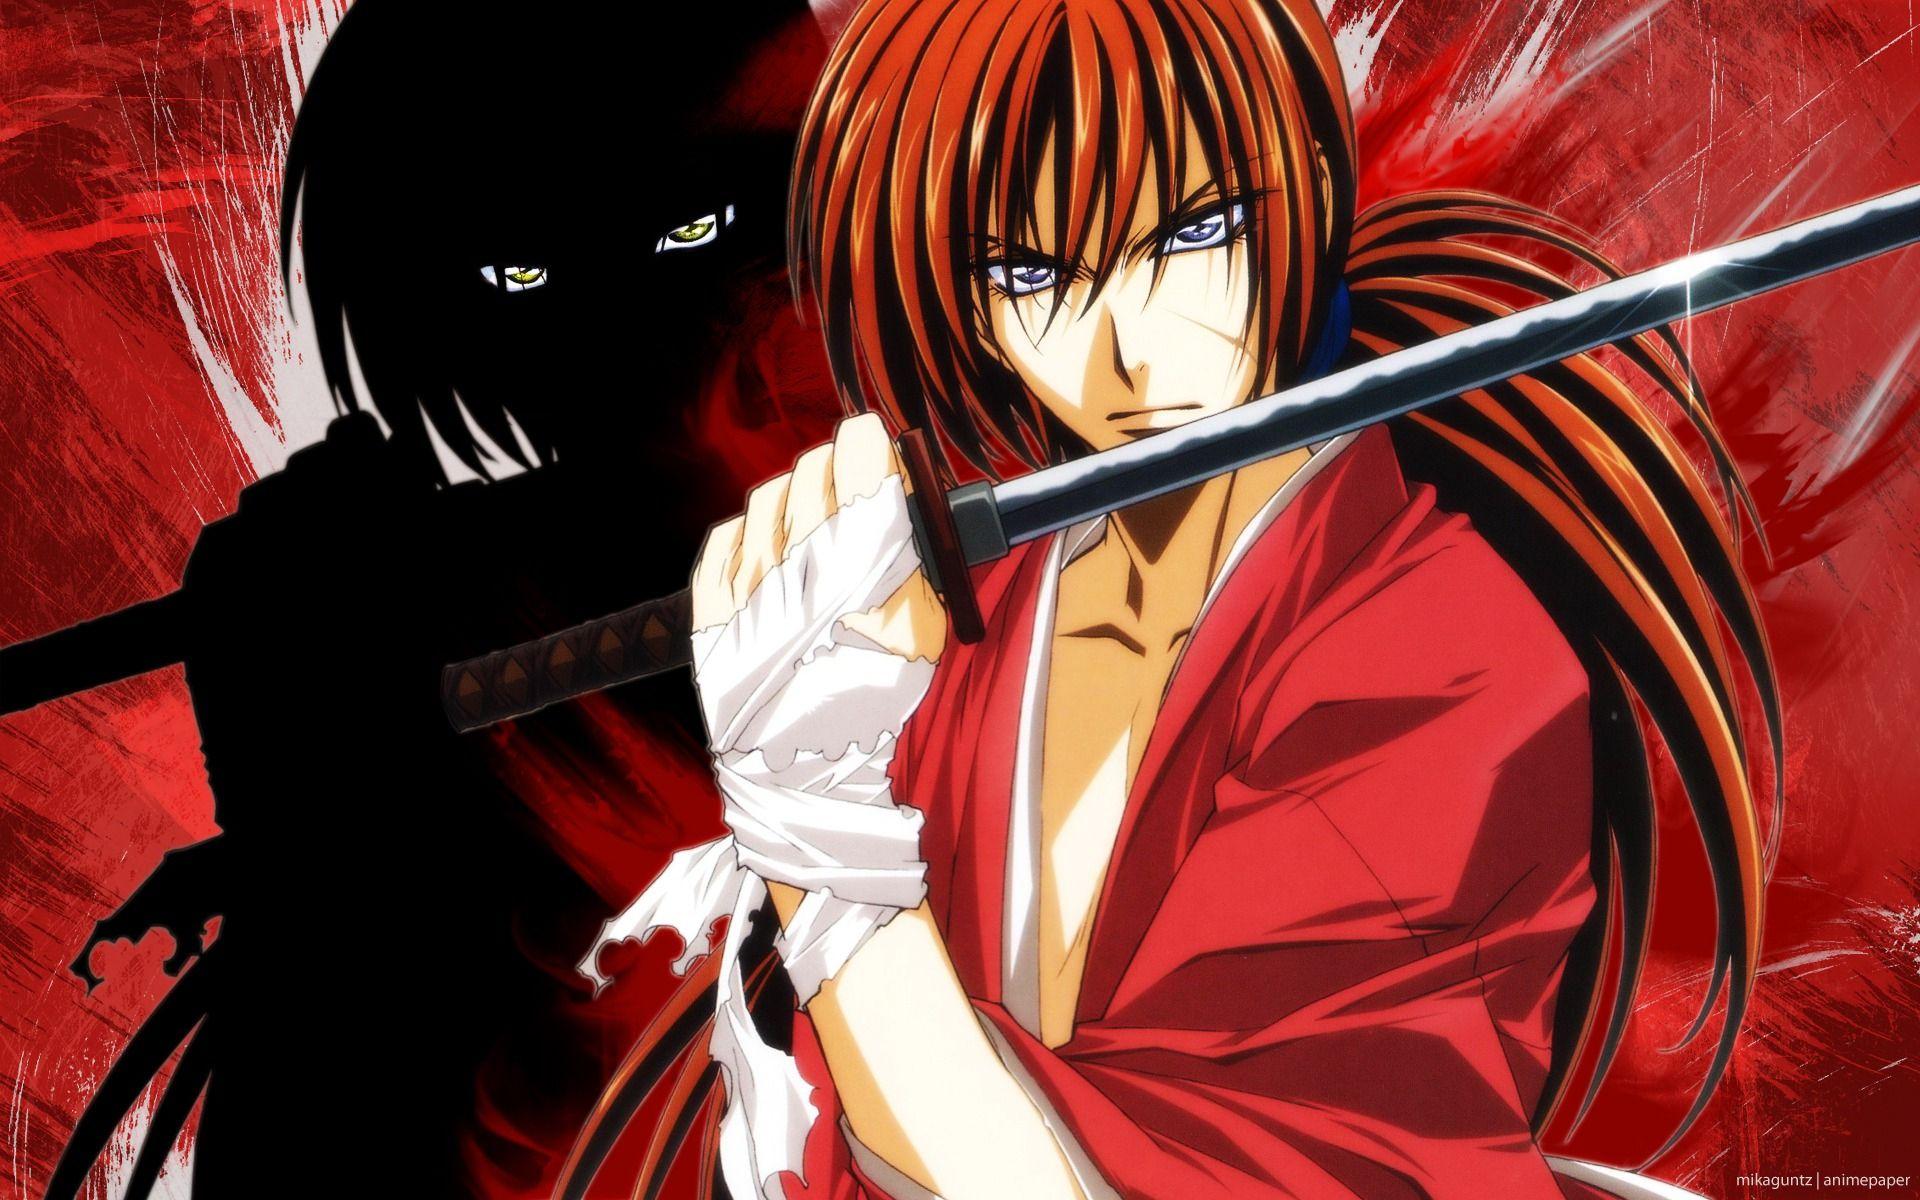 Rurouni Kenshin manslayer (With images) Rurouni kenshin